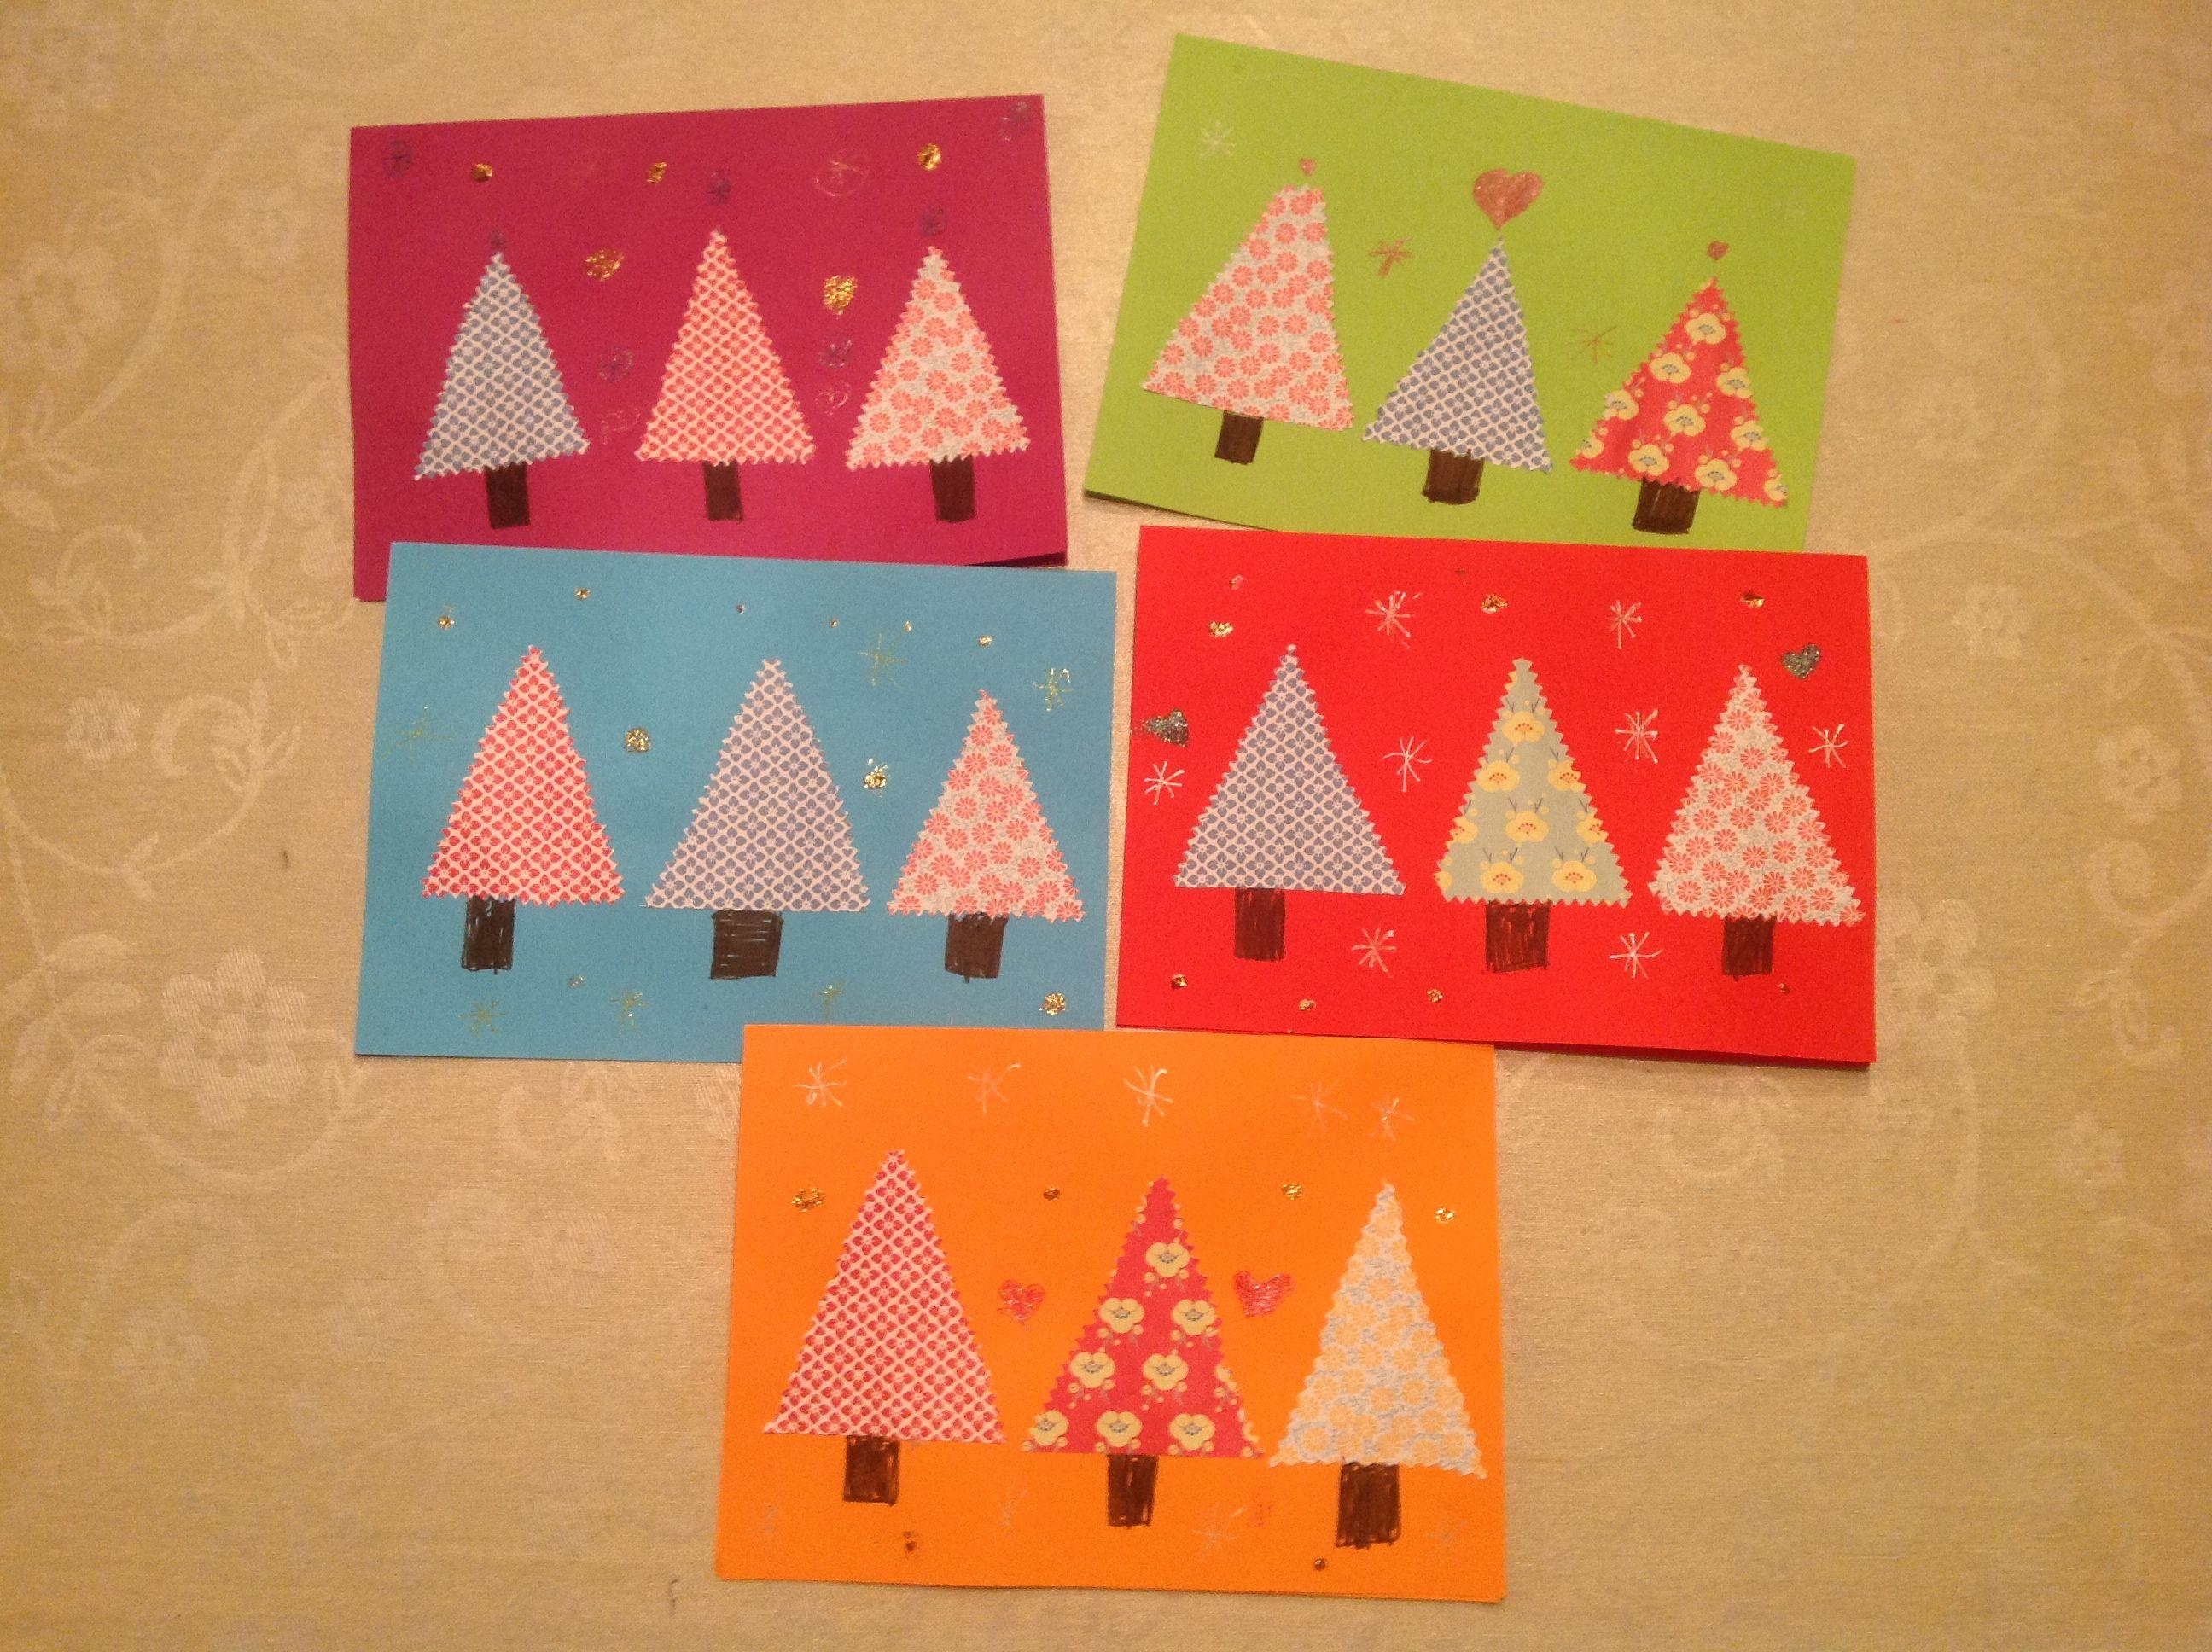 tarjetas de navidad navidad navidad christmas cards christmas crafts christmas